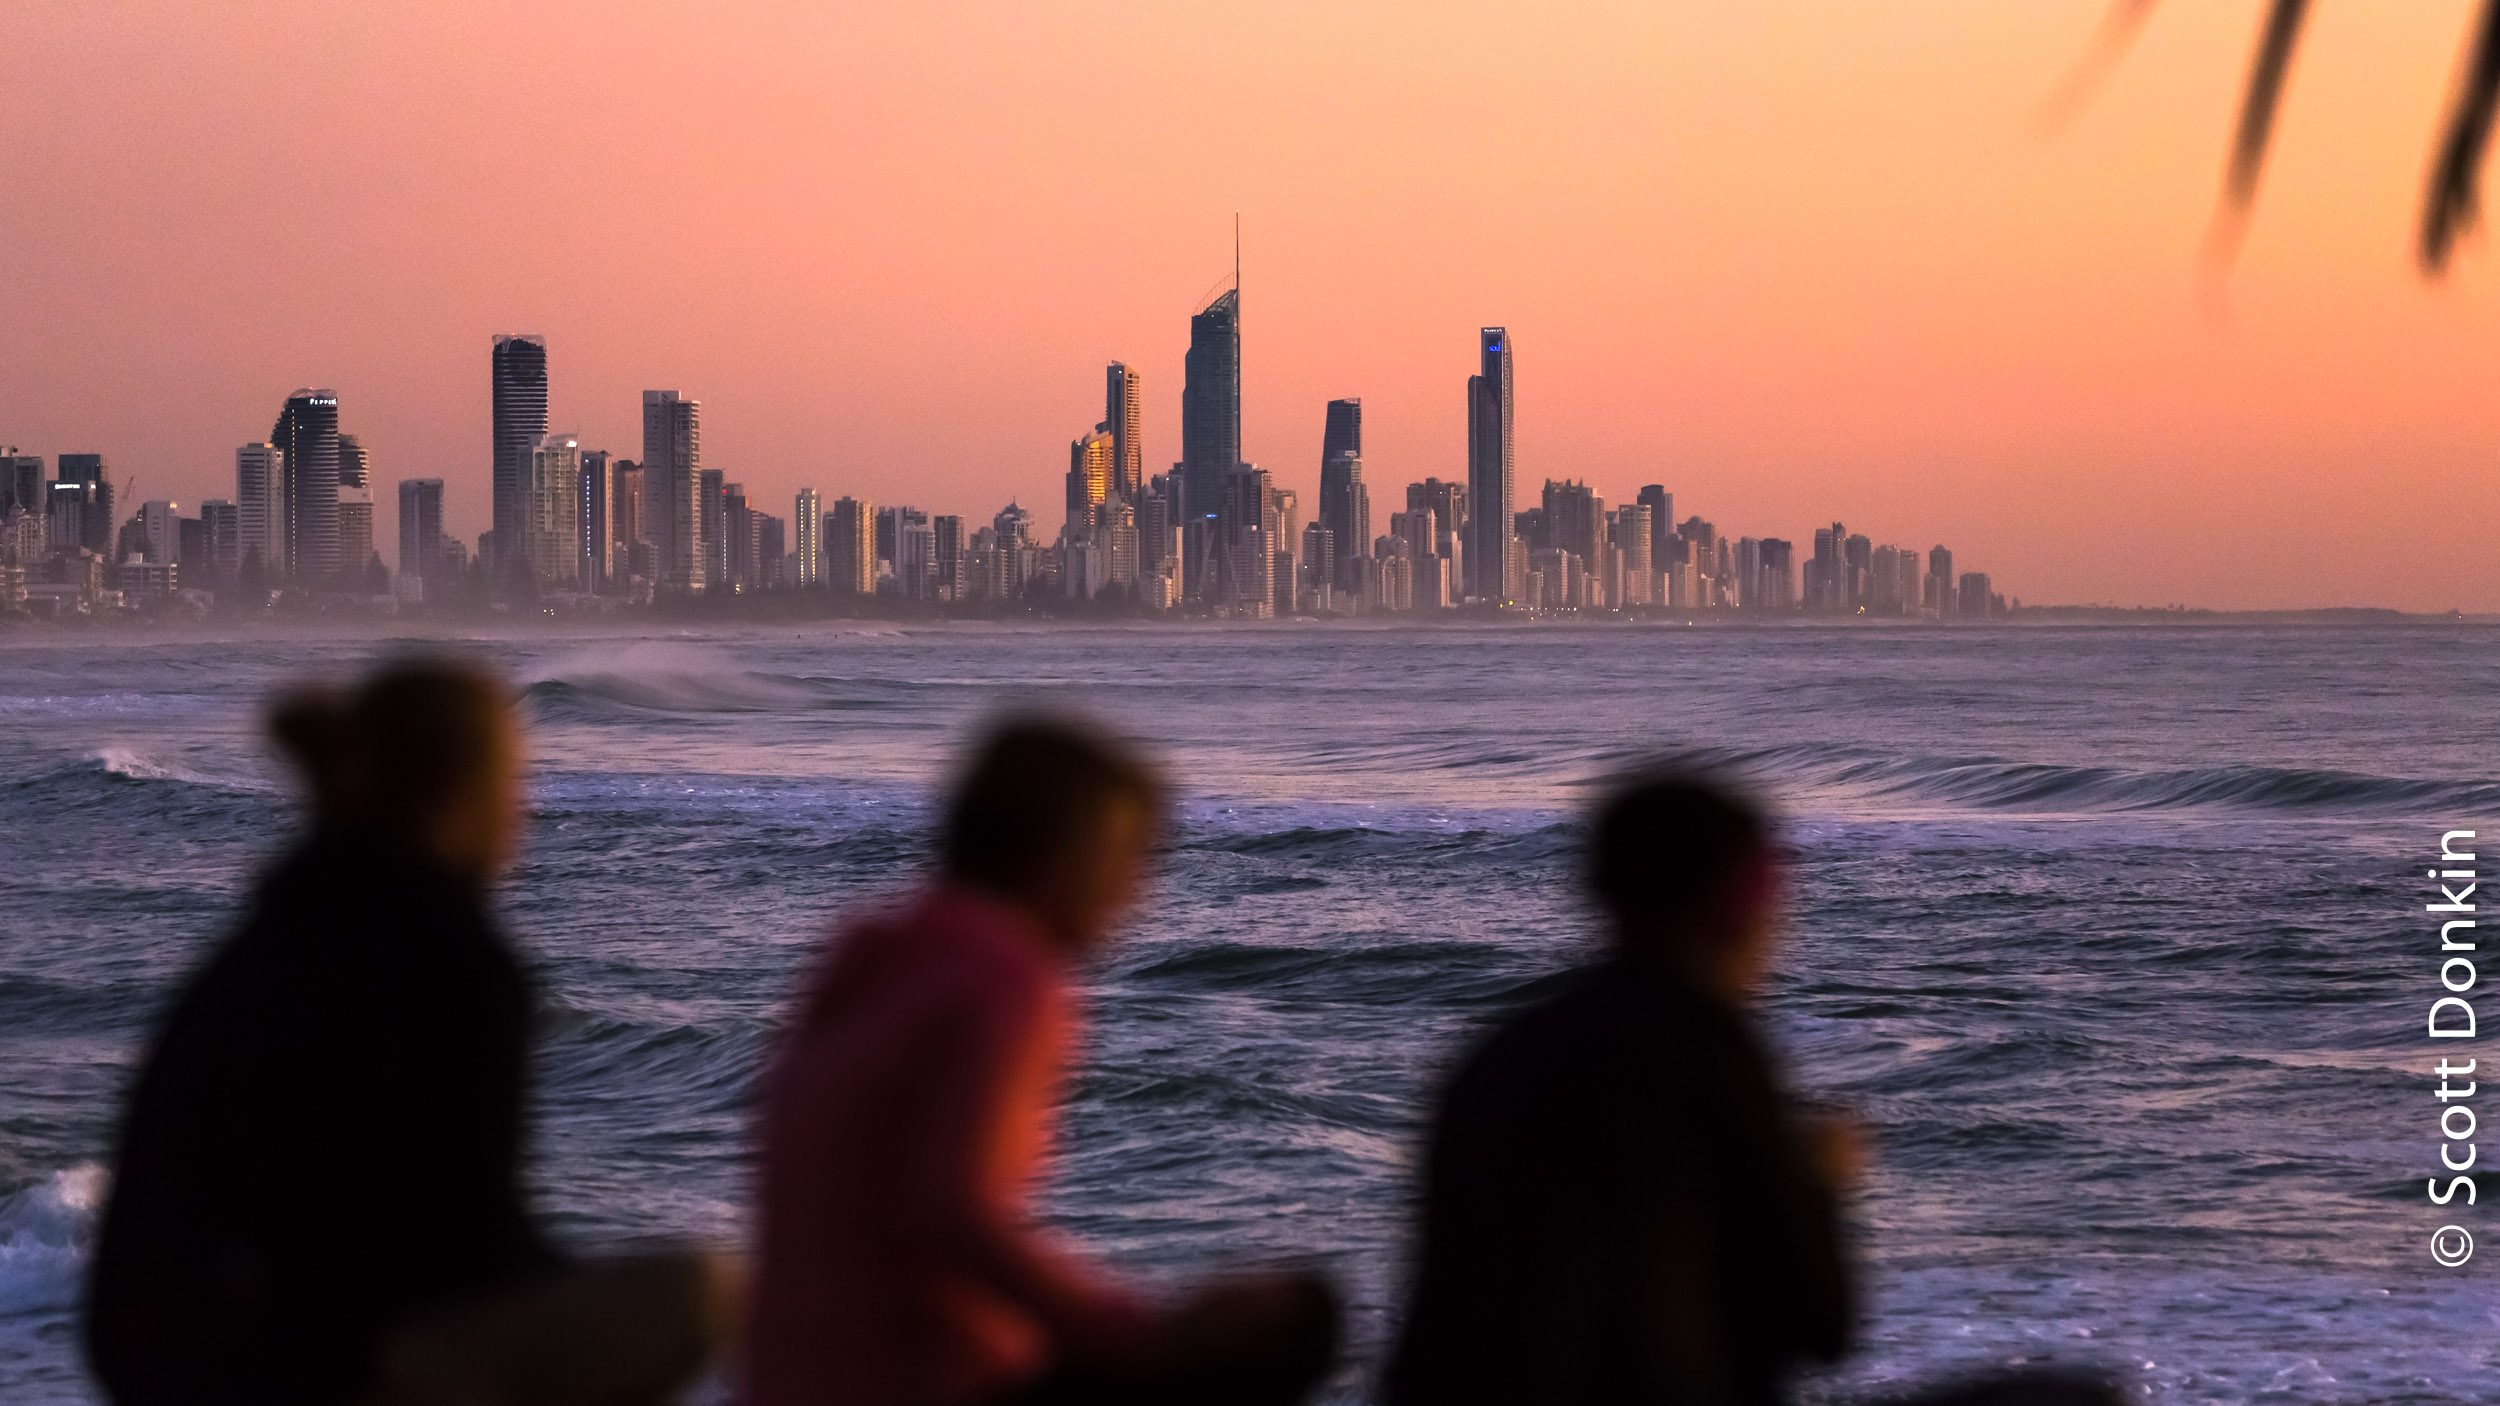 Friends, taking in the dawn. Burleigh Heads, Queensland.